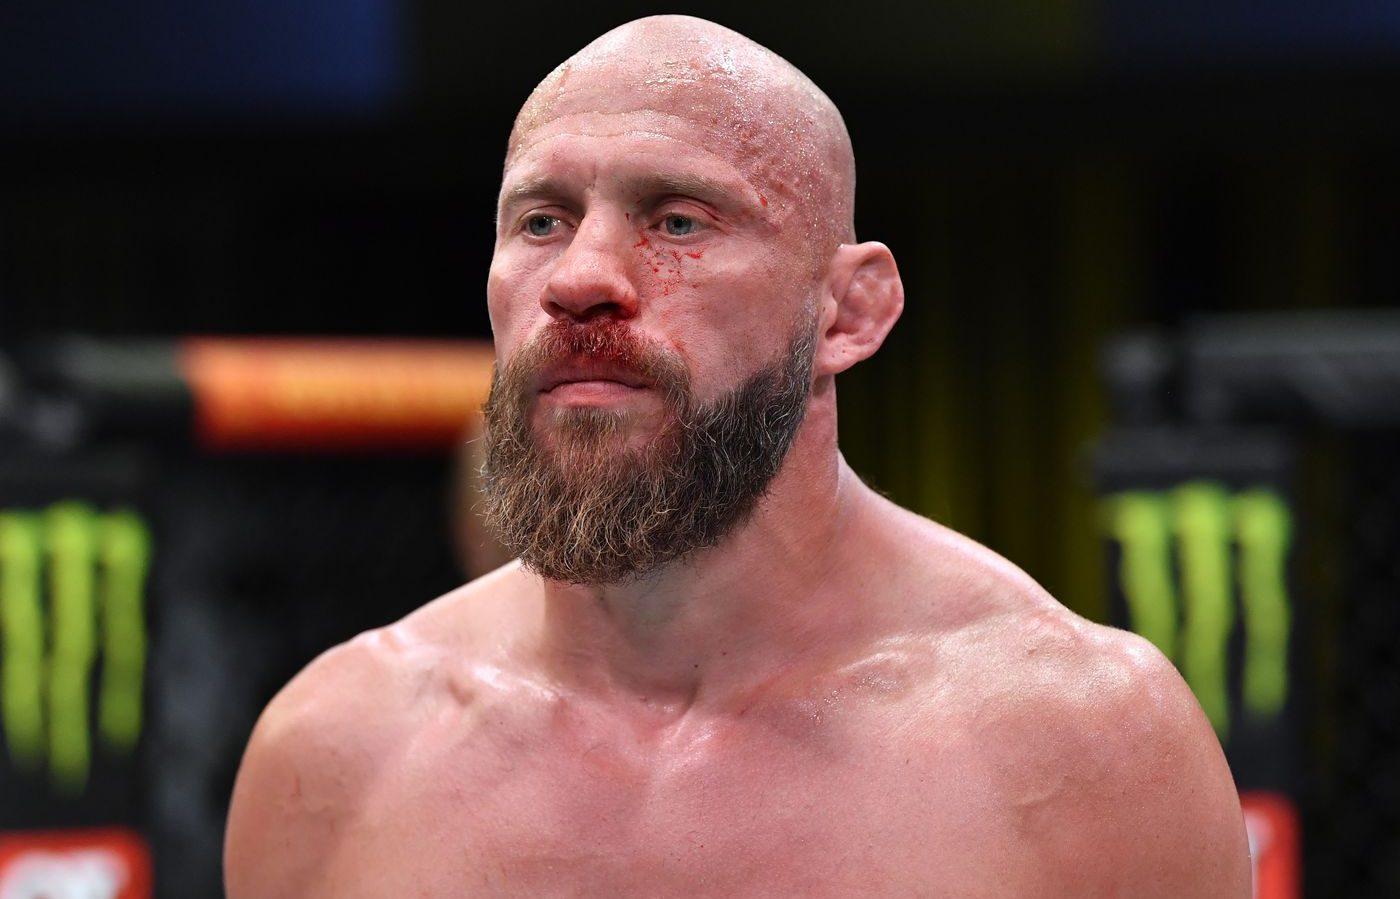 Donald Cerrone releases statement following his loss against Alex Morono at UFC Vegas 26 - Cerrone